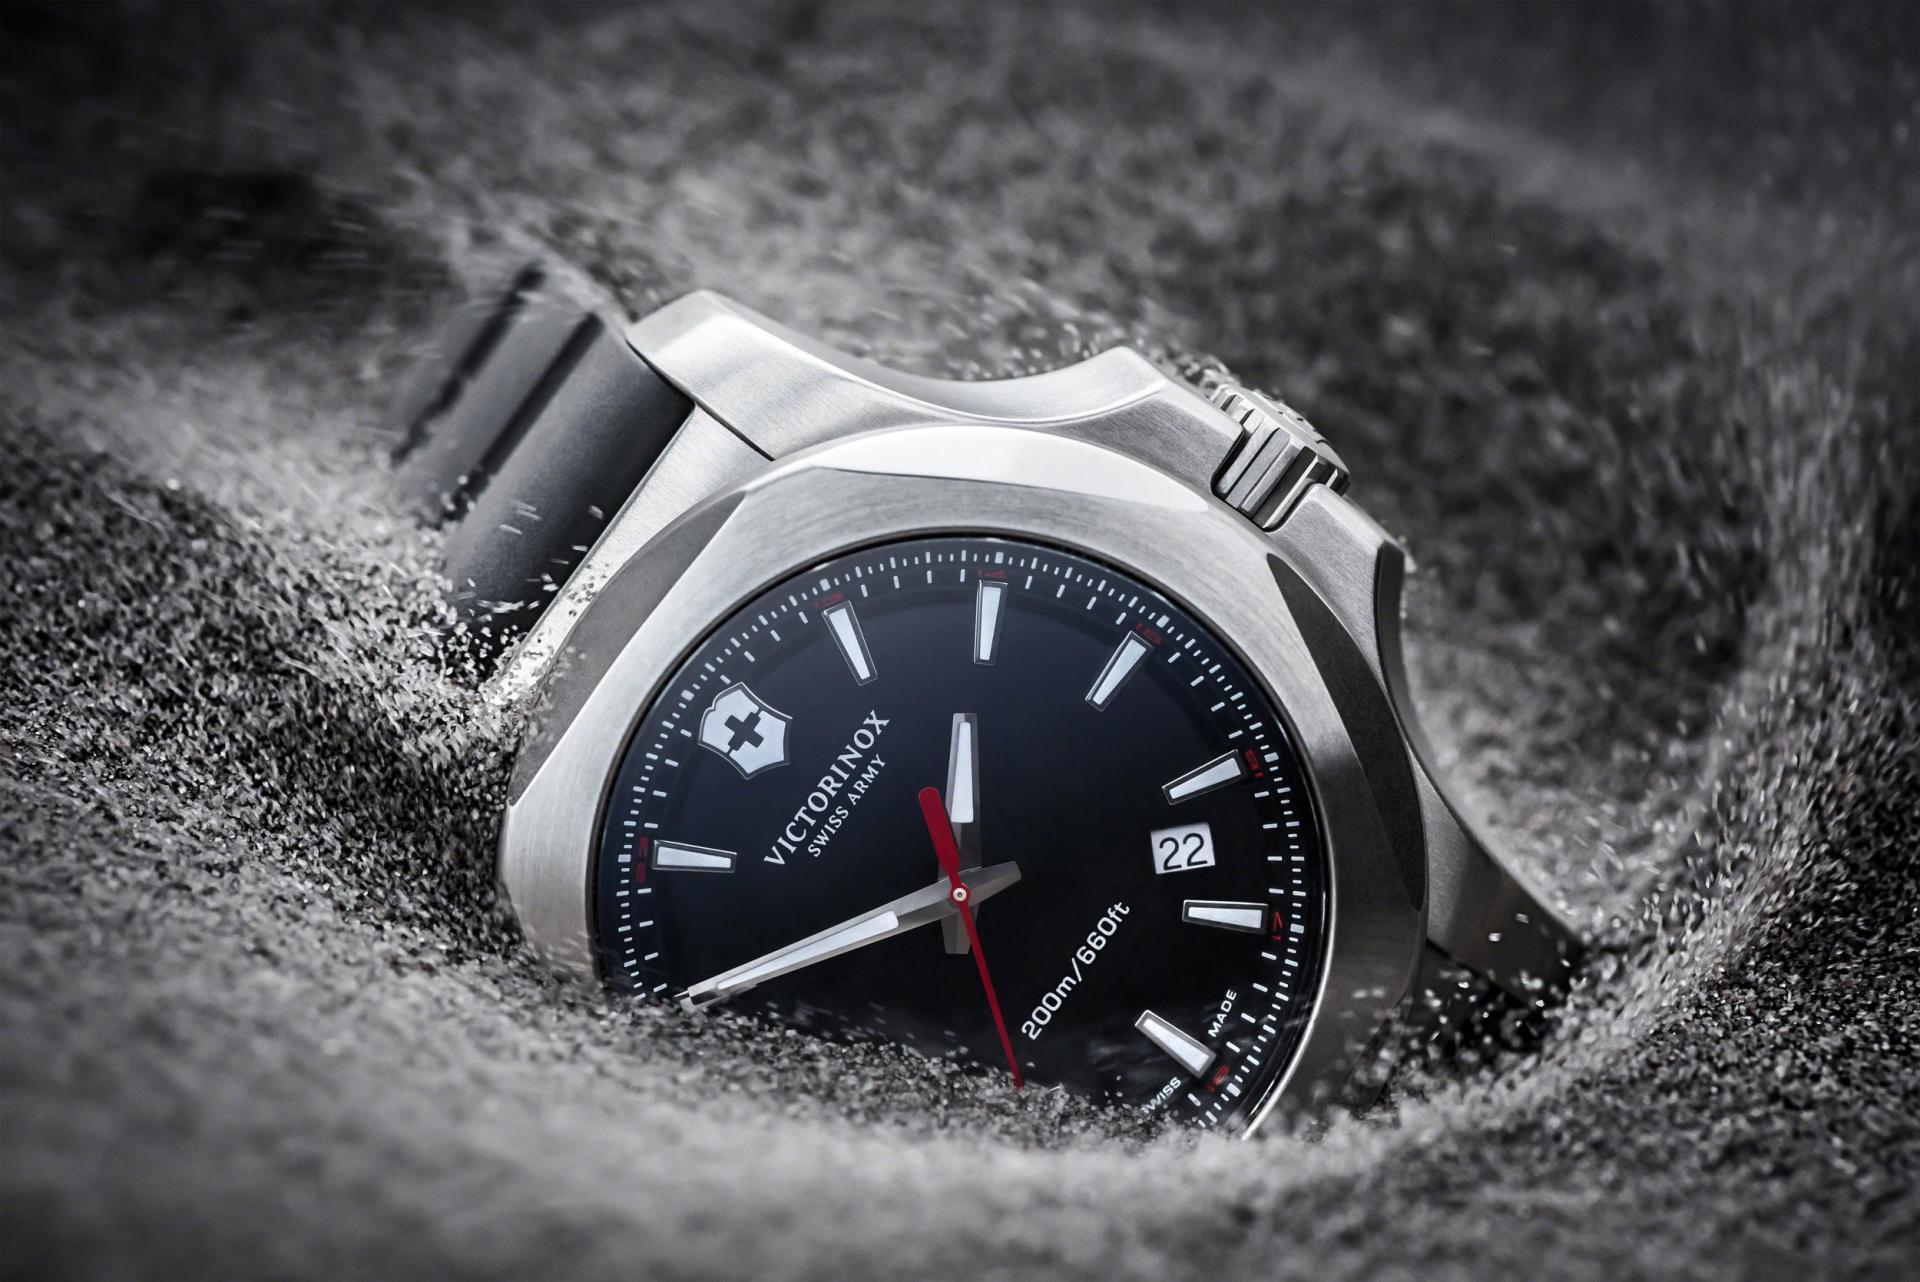 Naziv: Victorinox-Swiss-Army-INOX-watches-2.jpg, pregleda: 177, veličina: 271,4 KB